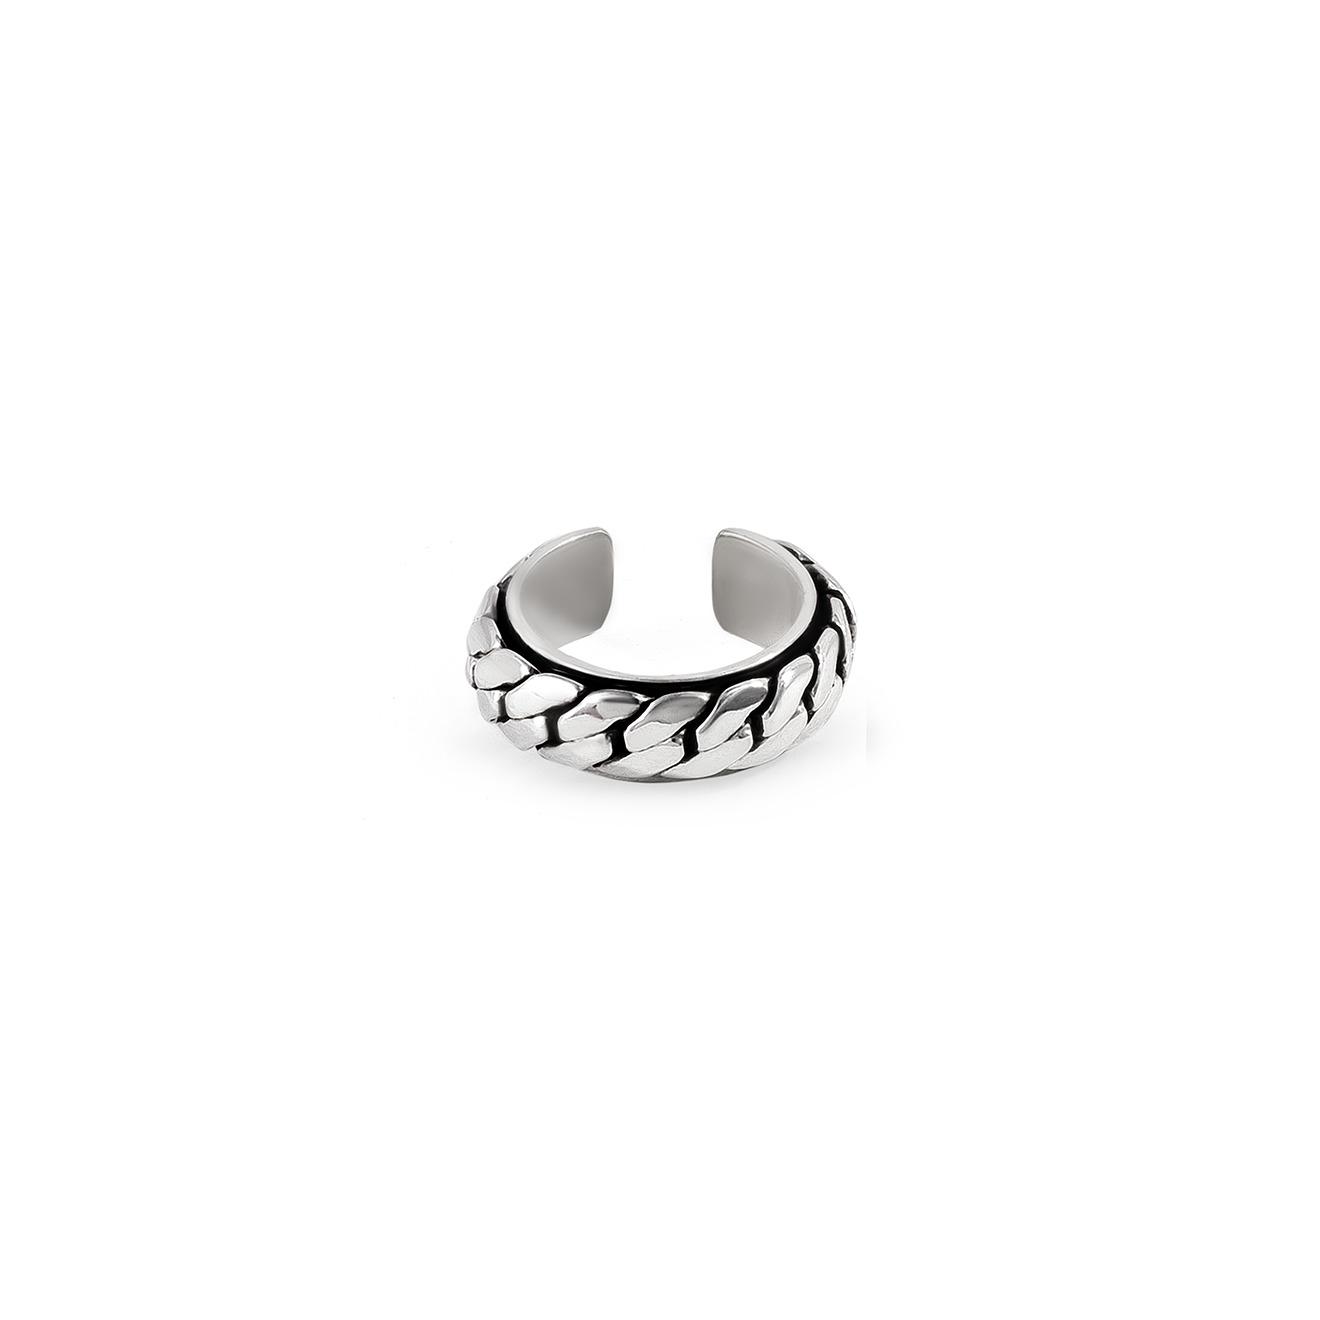 Philippe Audibert Покрытое серебром кольцо Salome